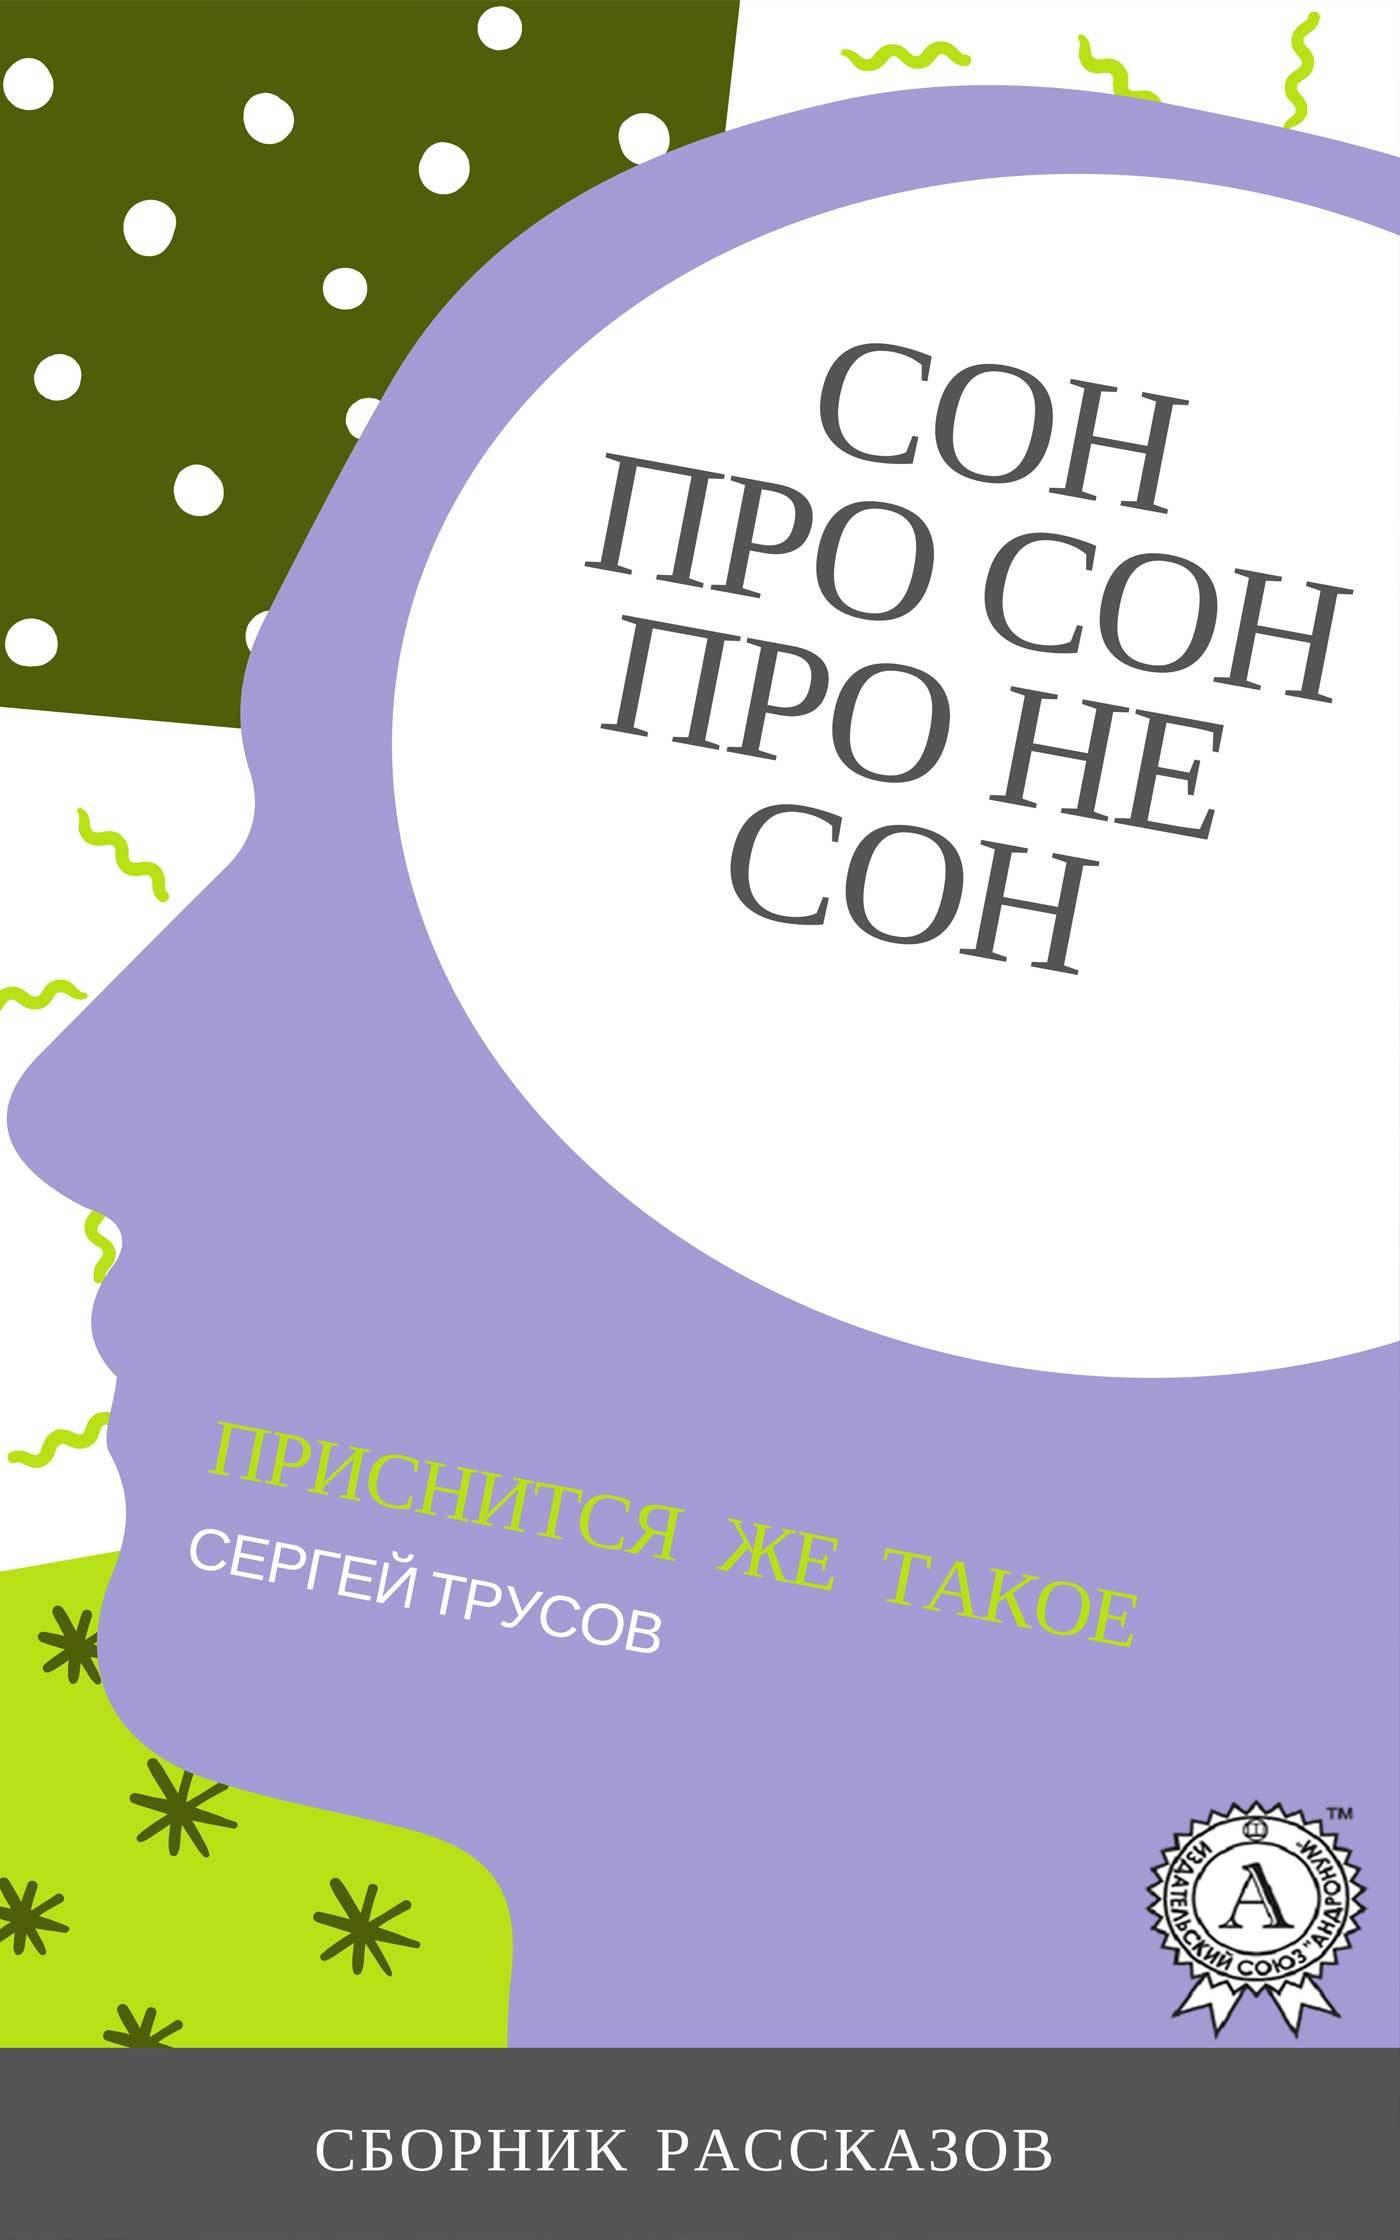 Сергей Трусов Сон, про сон, про не сон льюис кэрролл alice in wonderland retold in words of one syllable